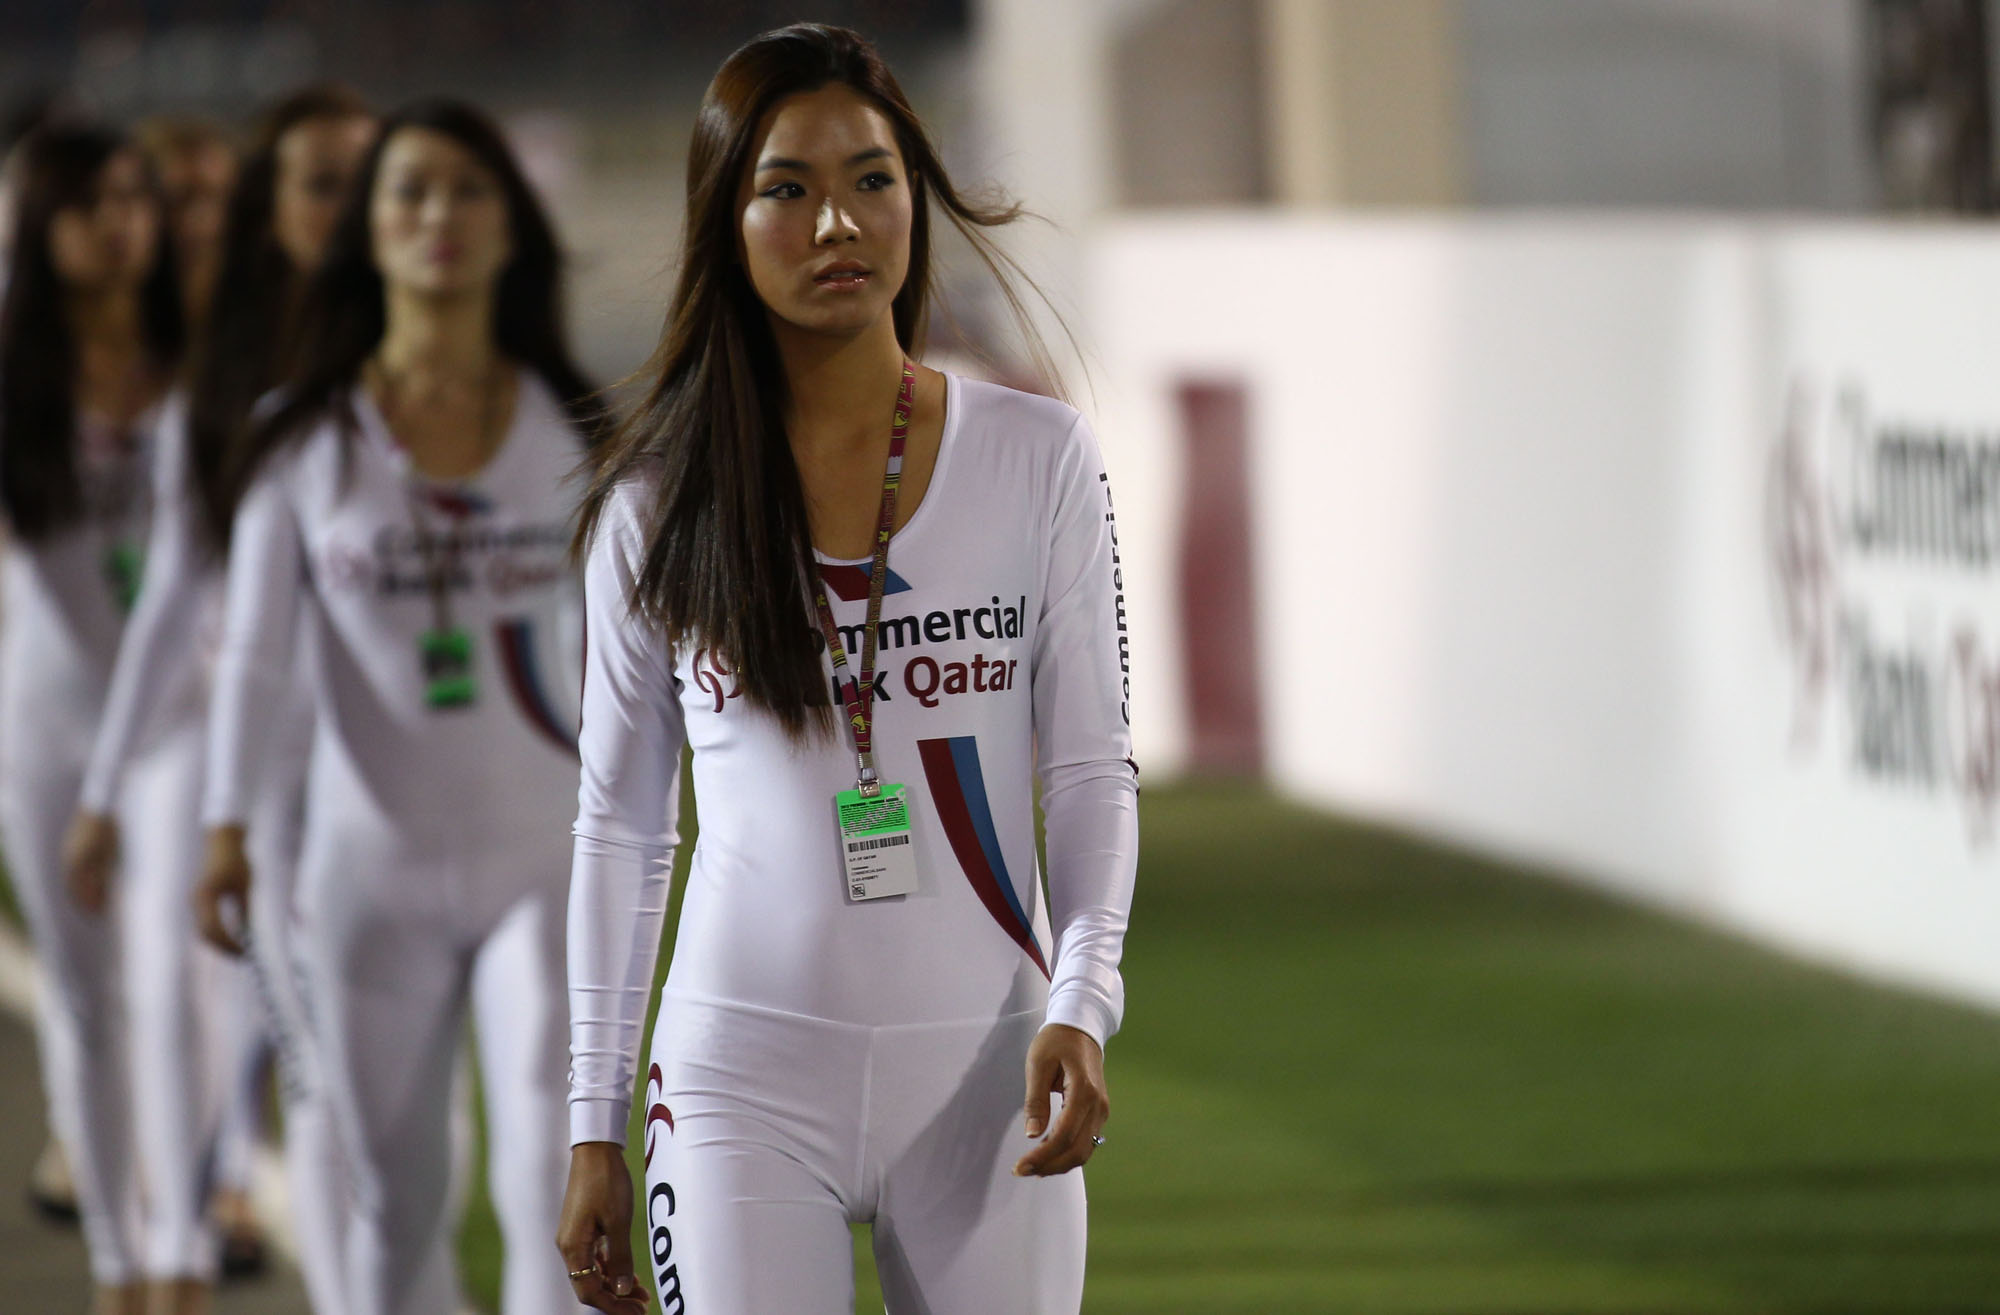 MotoGP Grid Girl Gallery - Qatar 2012 | Visordown